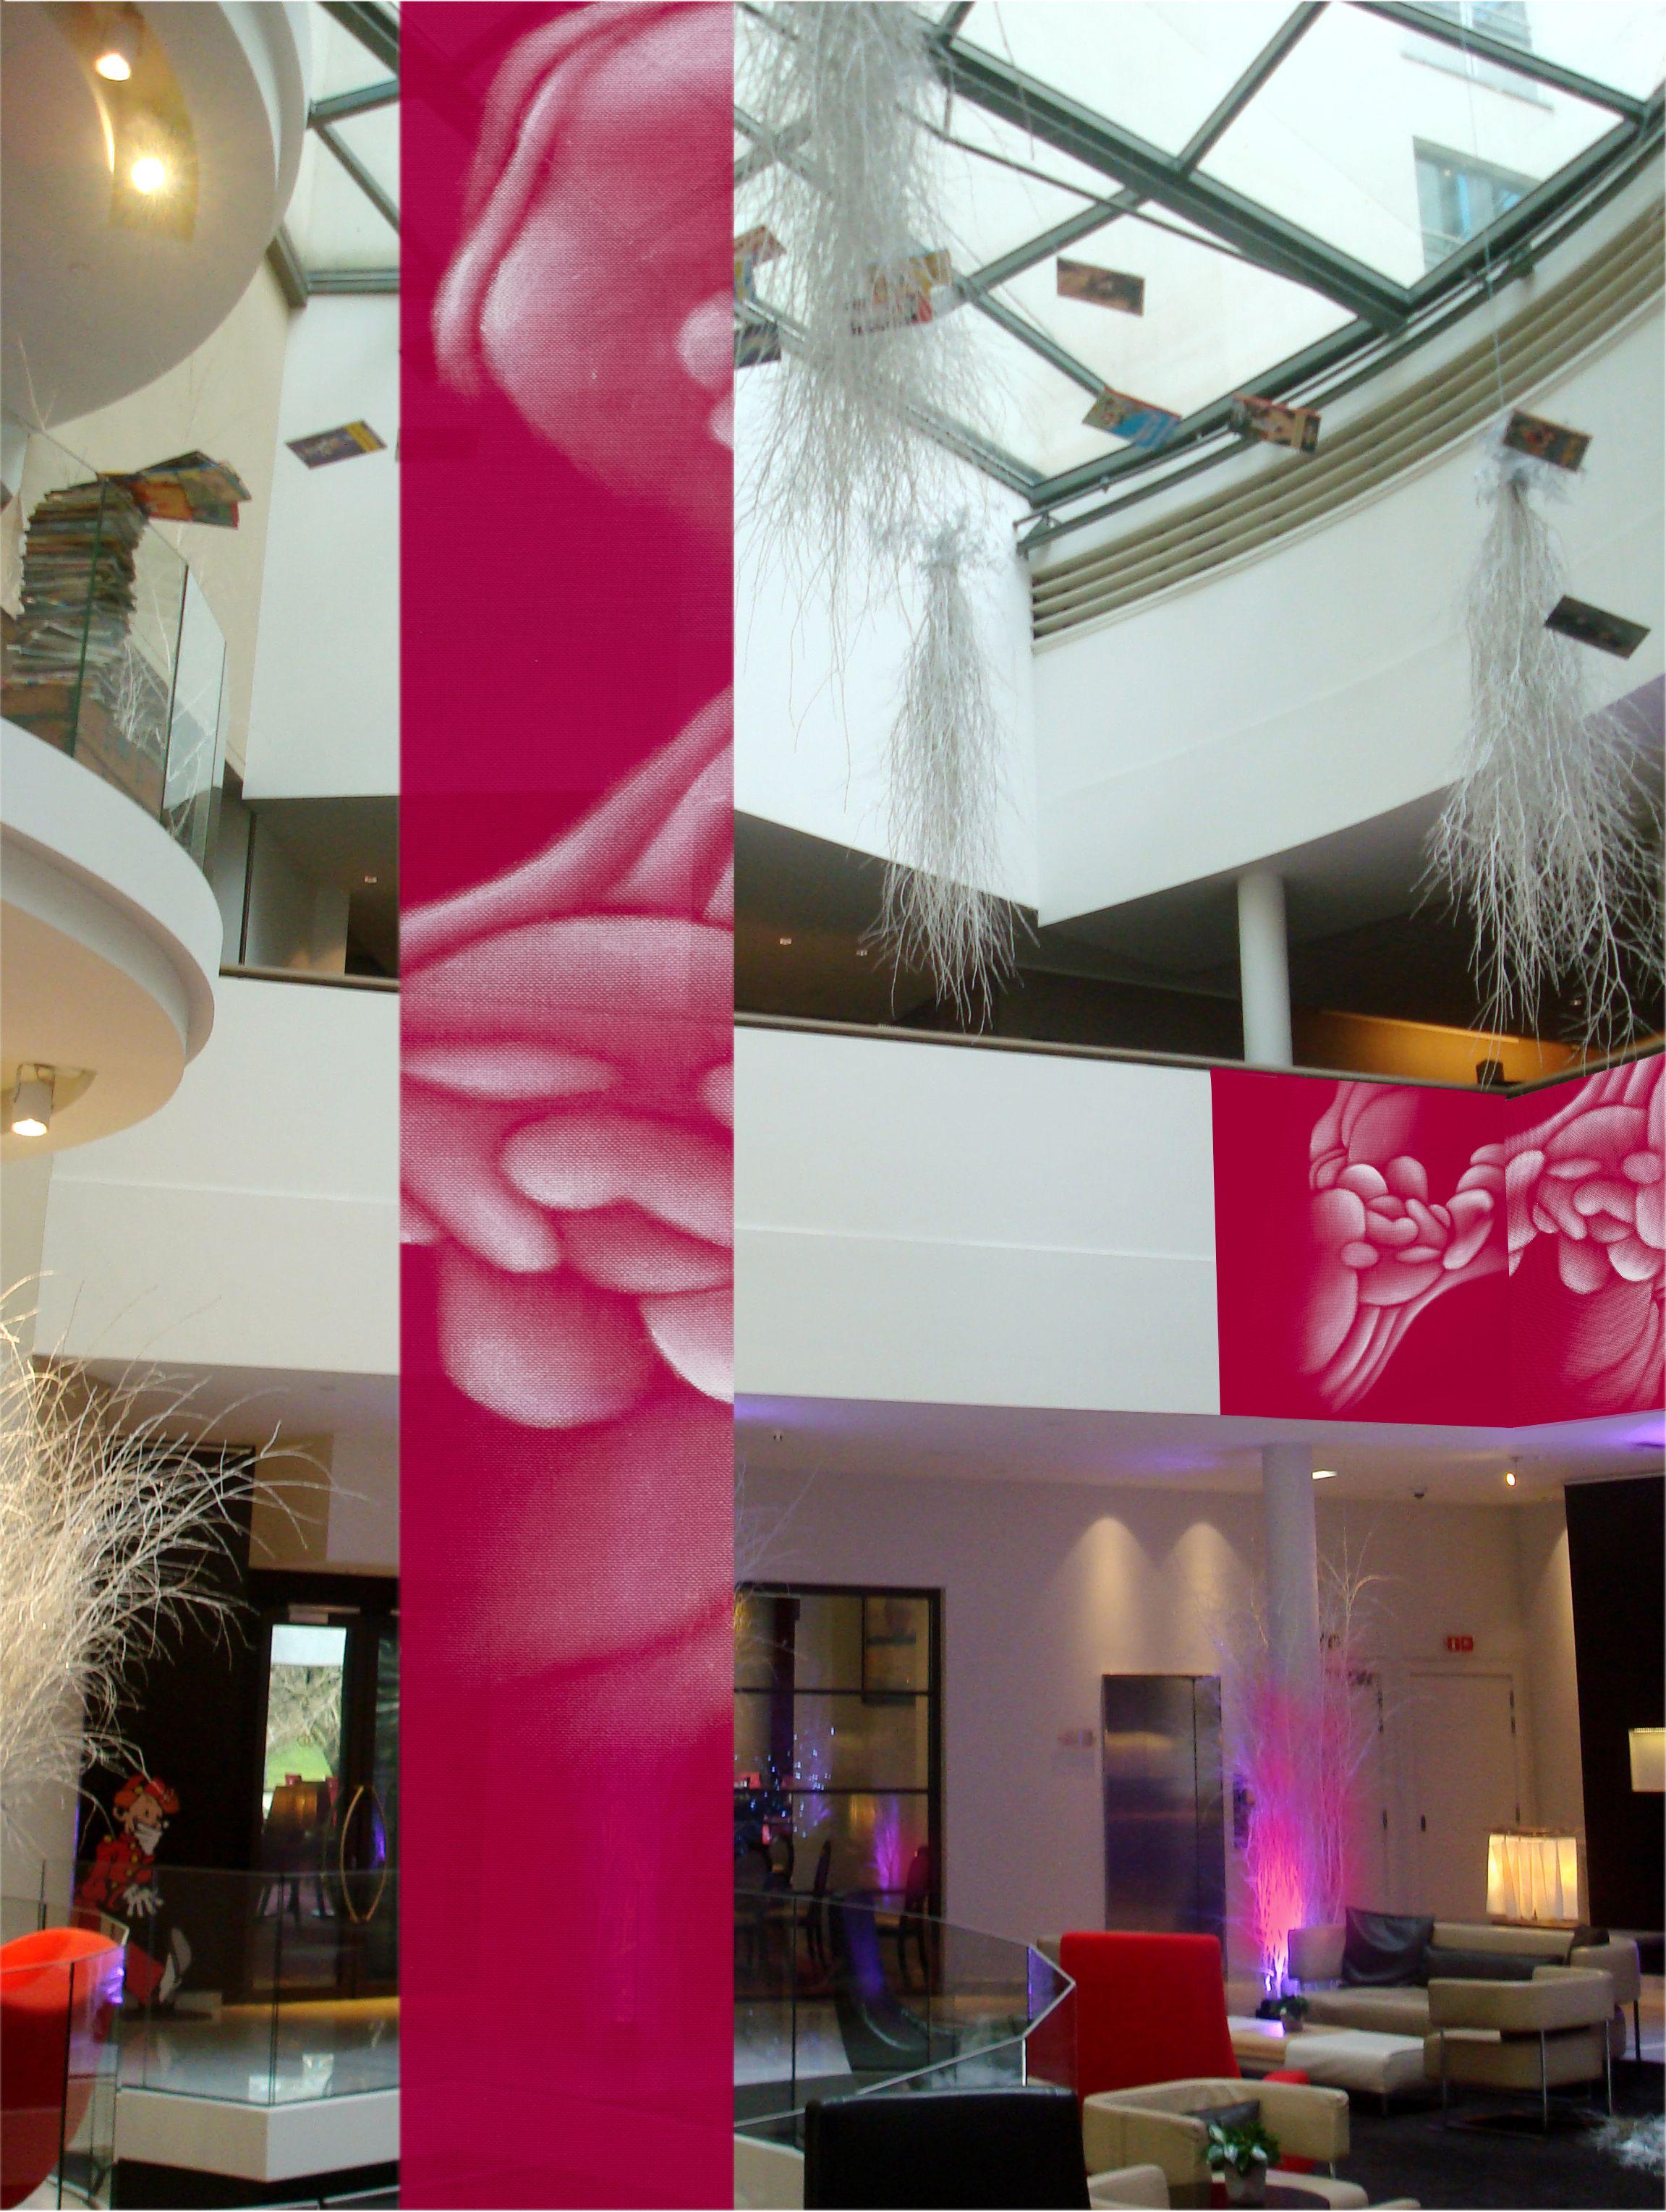 Guillaume bottazzi produces by sofitel brussels europe hotel sofitel brussels europe hotel is a symbol